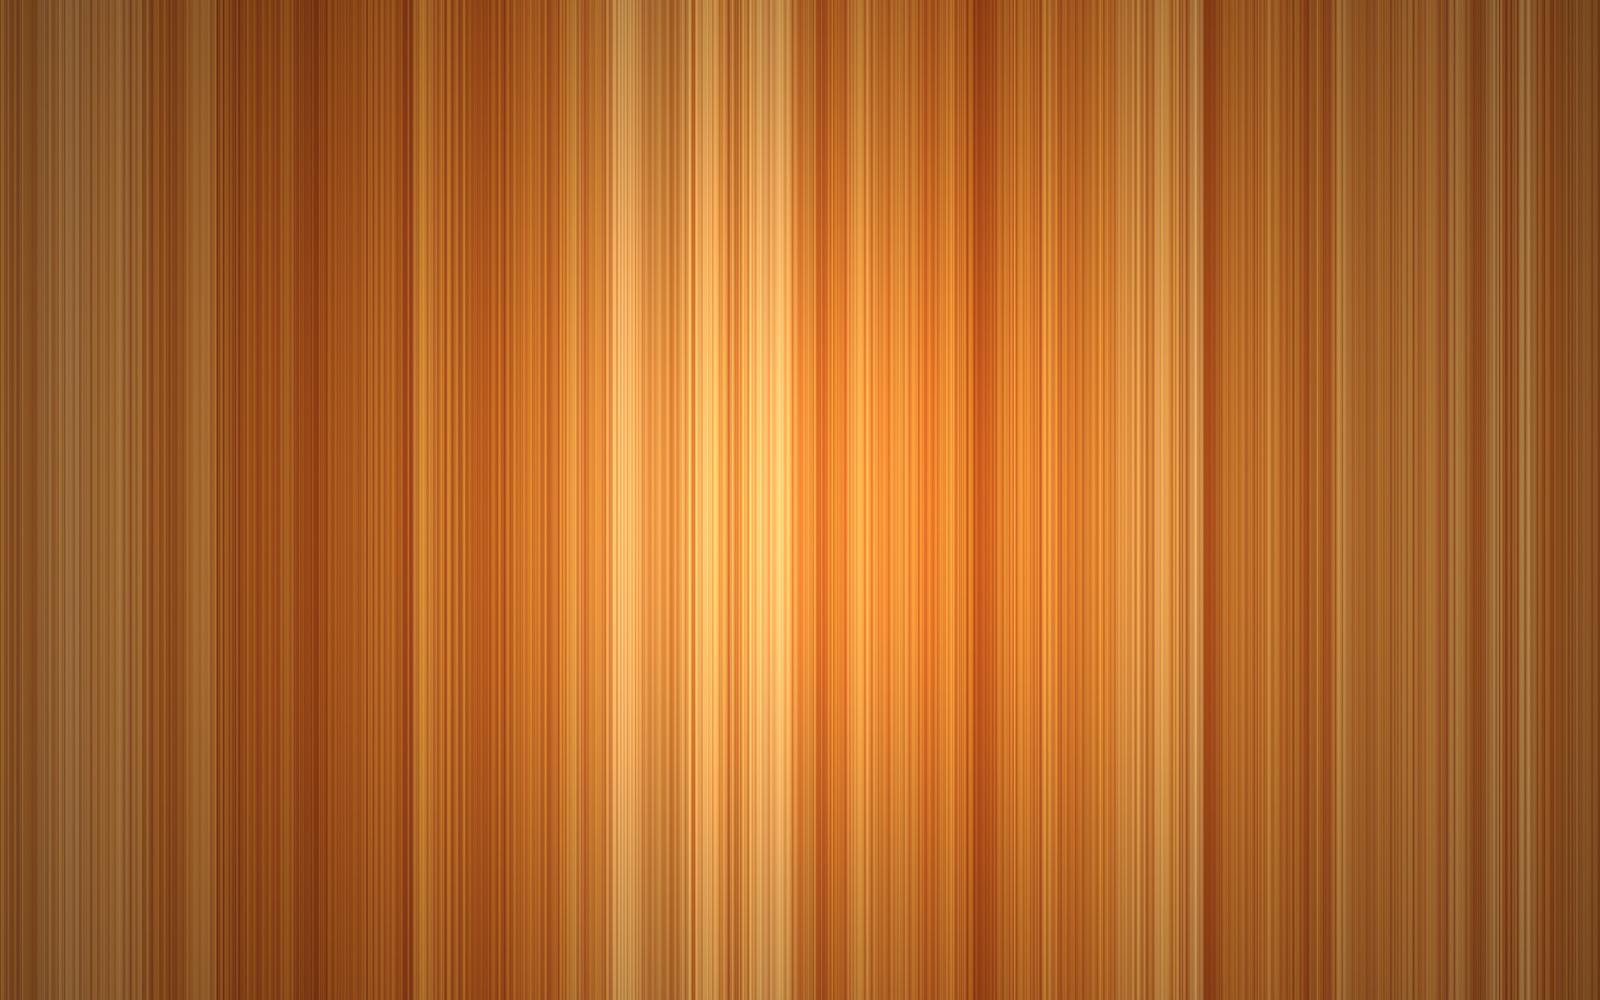 Wood wallpaper full hd impremedia full hd wallpapers backgrounds wood lines orange voltagebd Choice Image